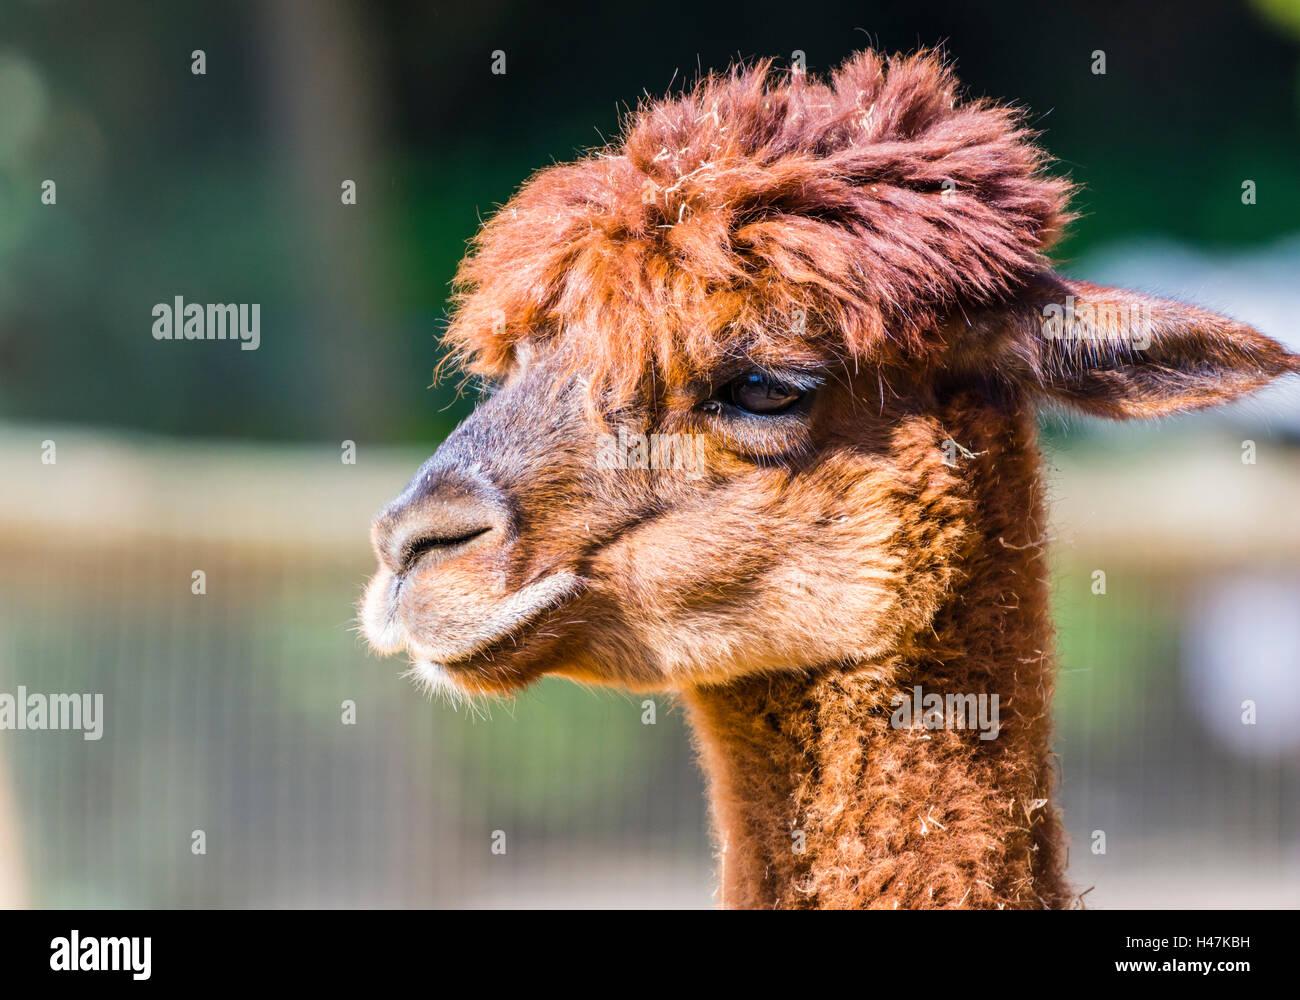 Red Llama captured in the sunlight, London, UK. - Stock Image